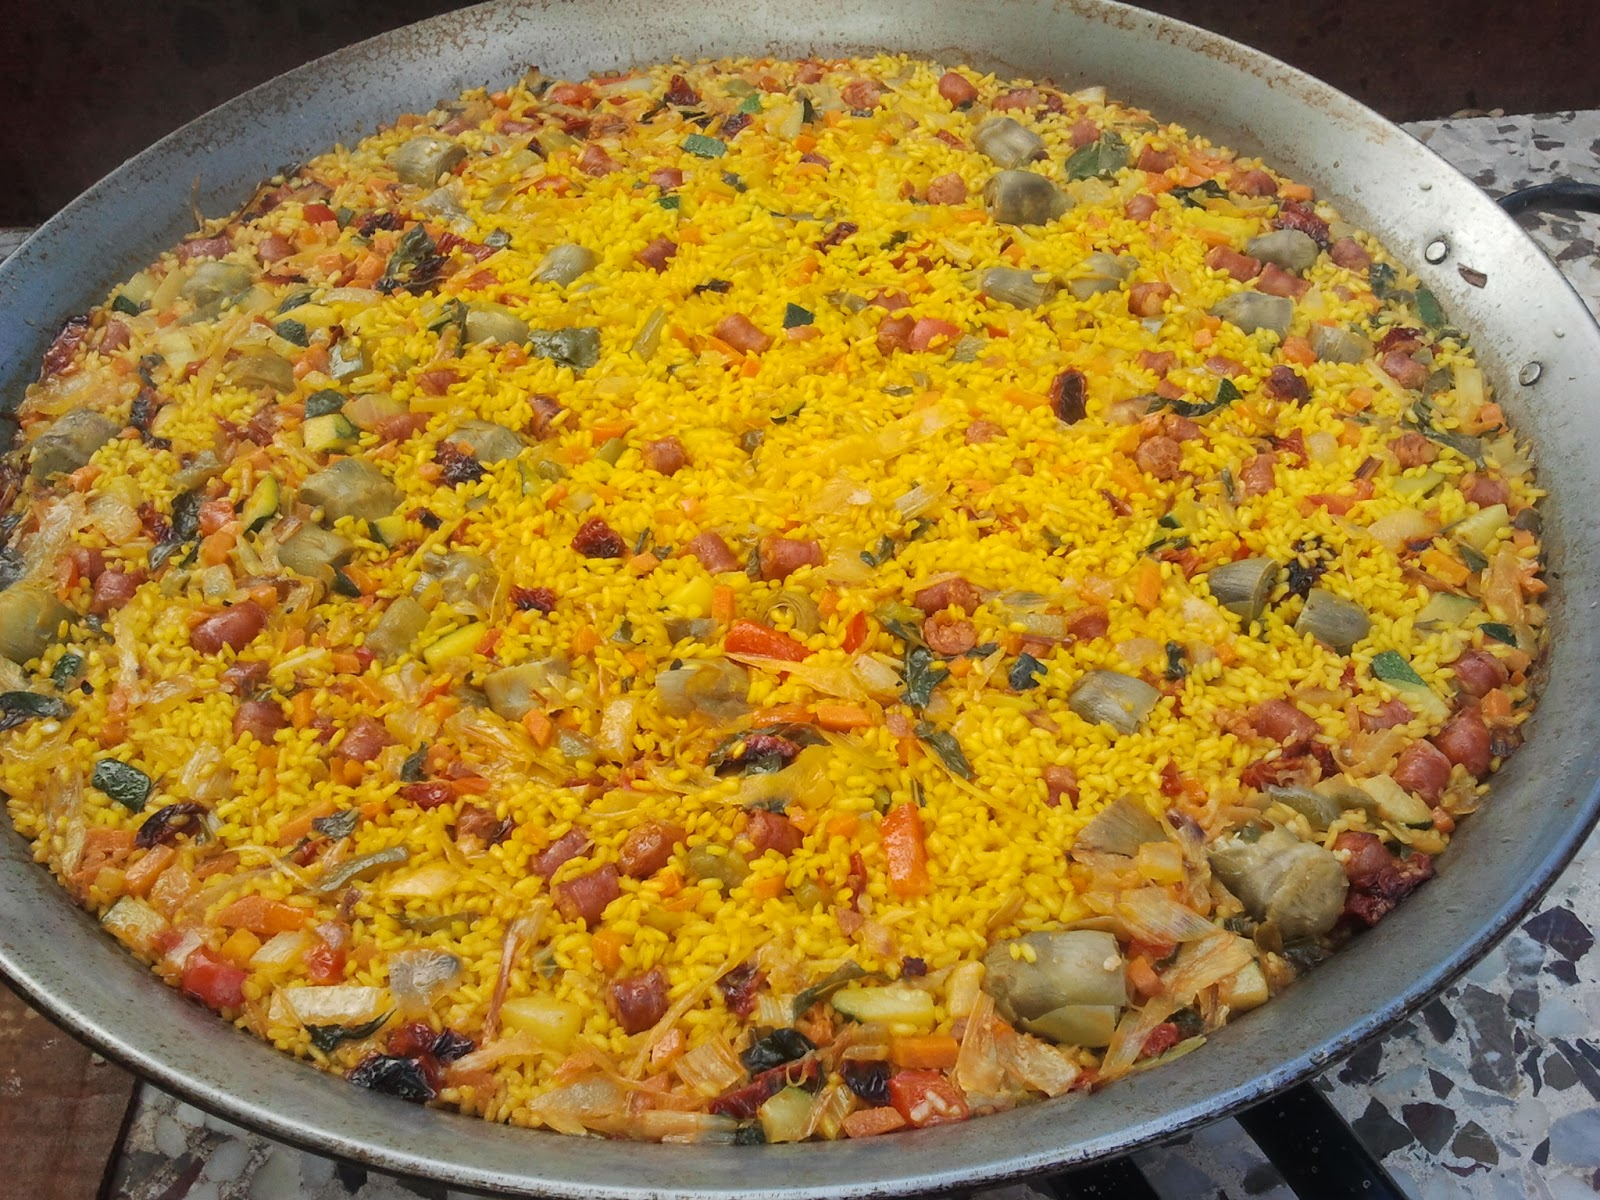 Las comidicas de mamen paella de verduras for Como hacer paella de verduras